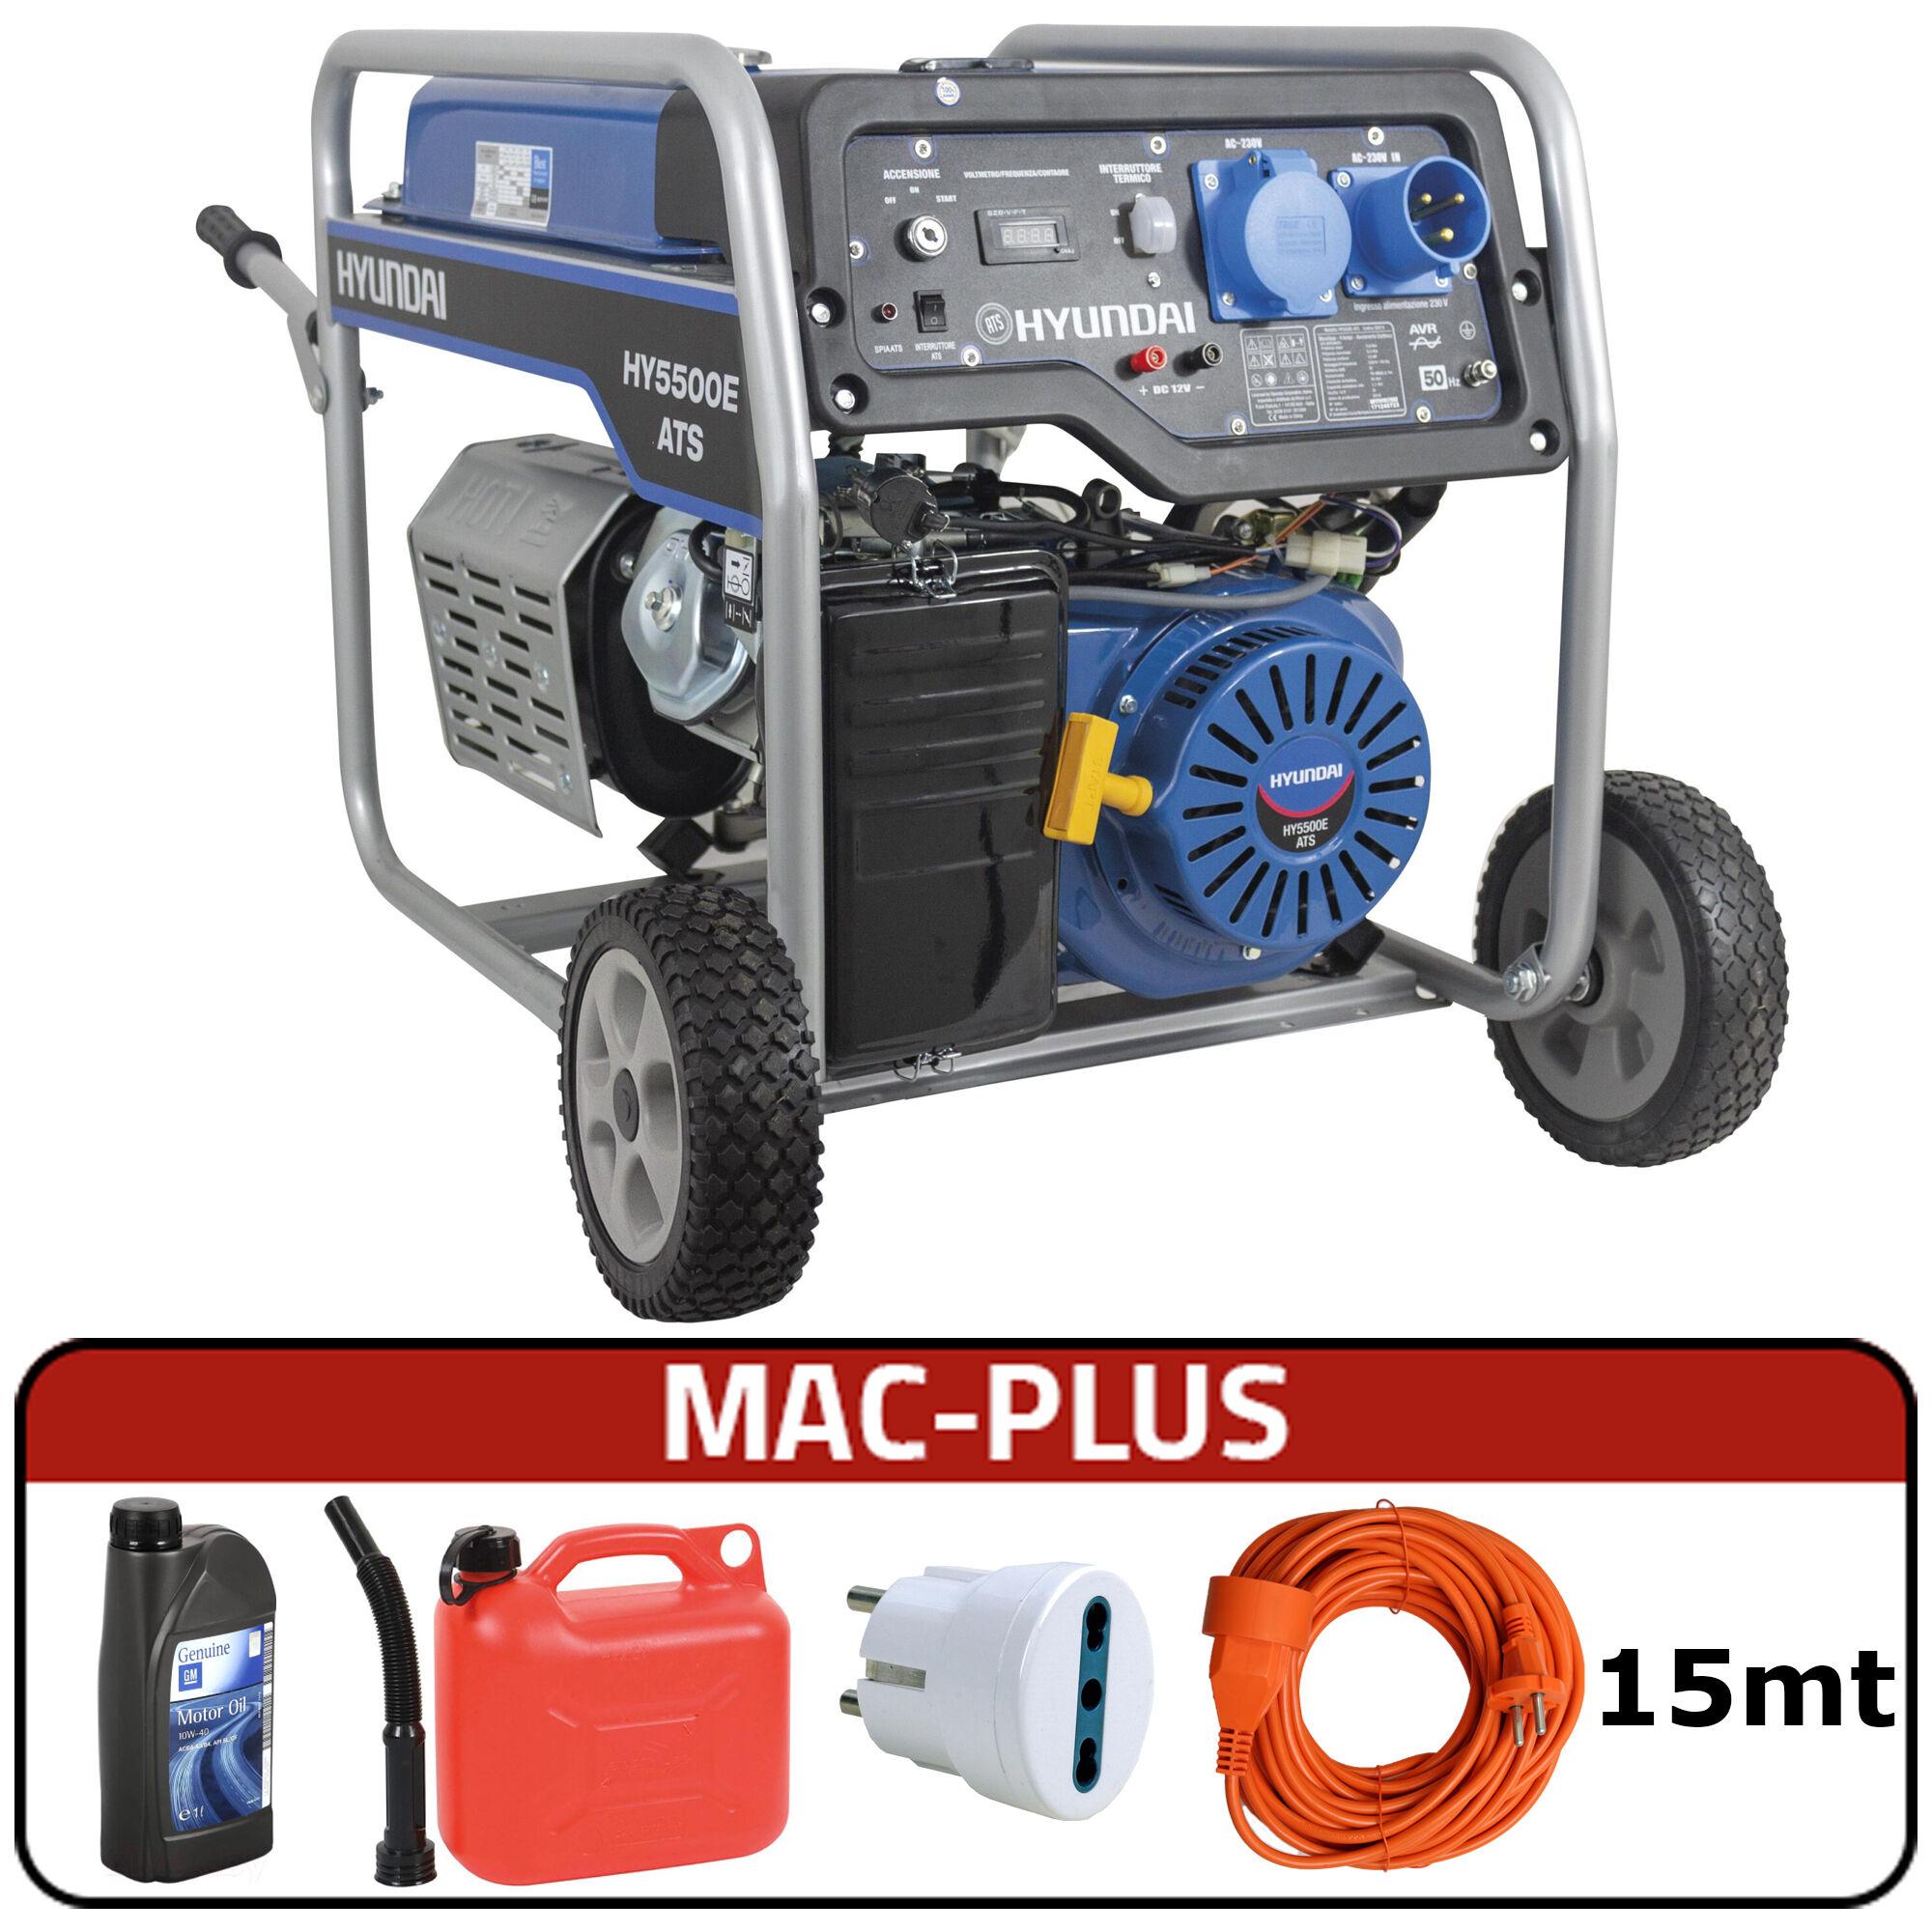 hyundai generatore di corrente hyundai 65014 - hy5500e ats con avr + mac-plus